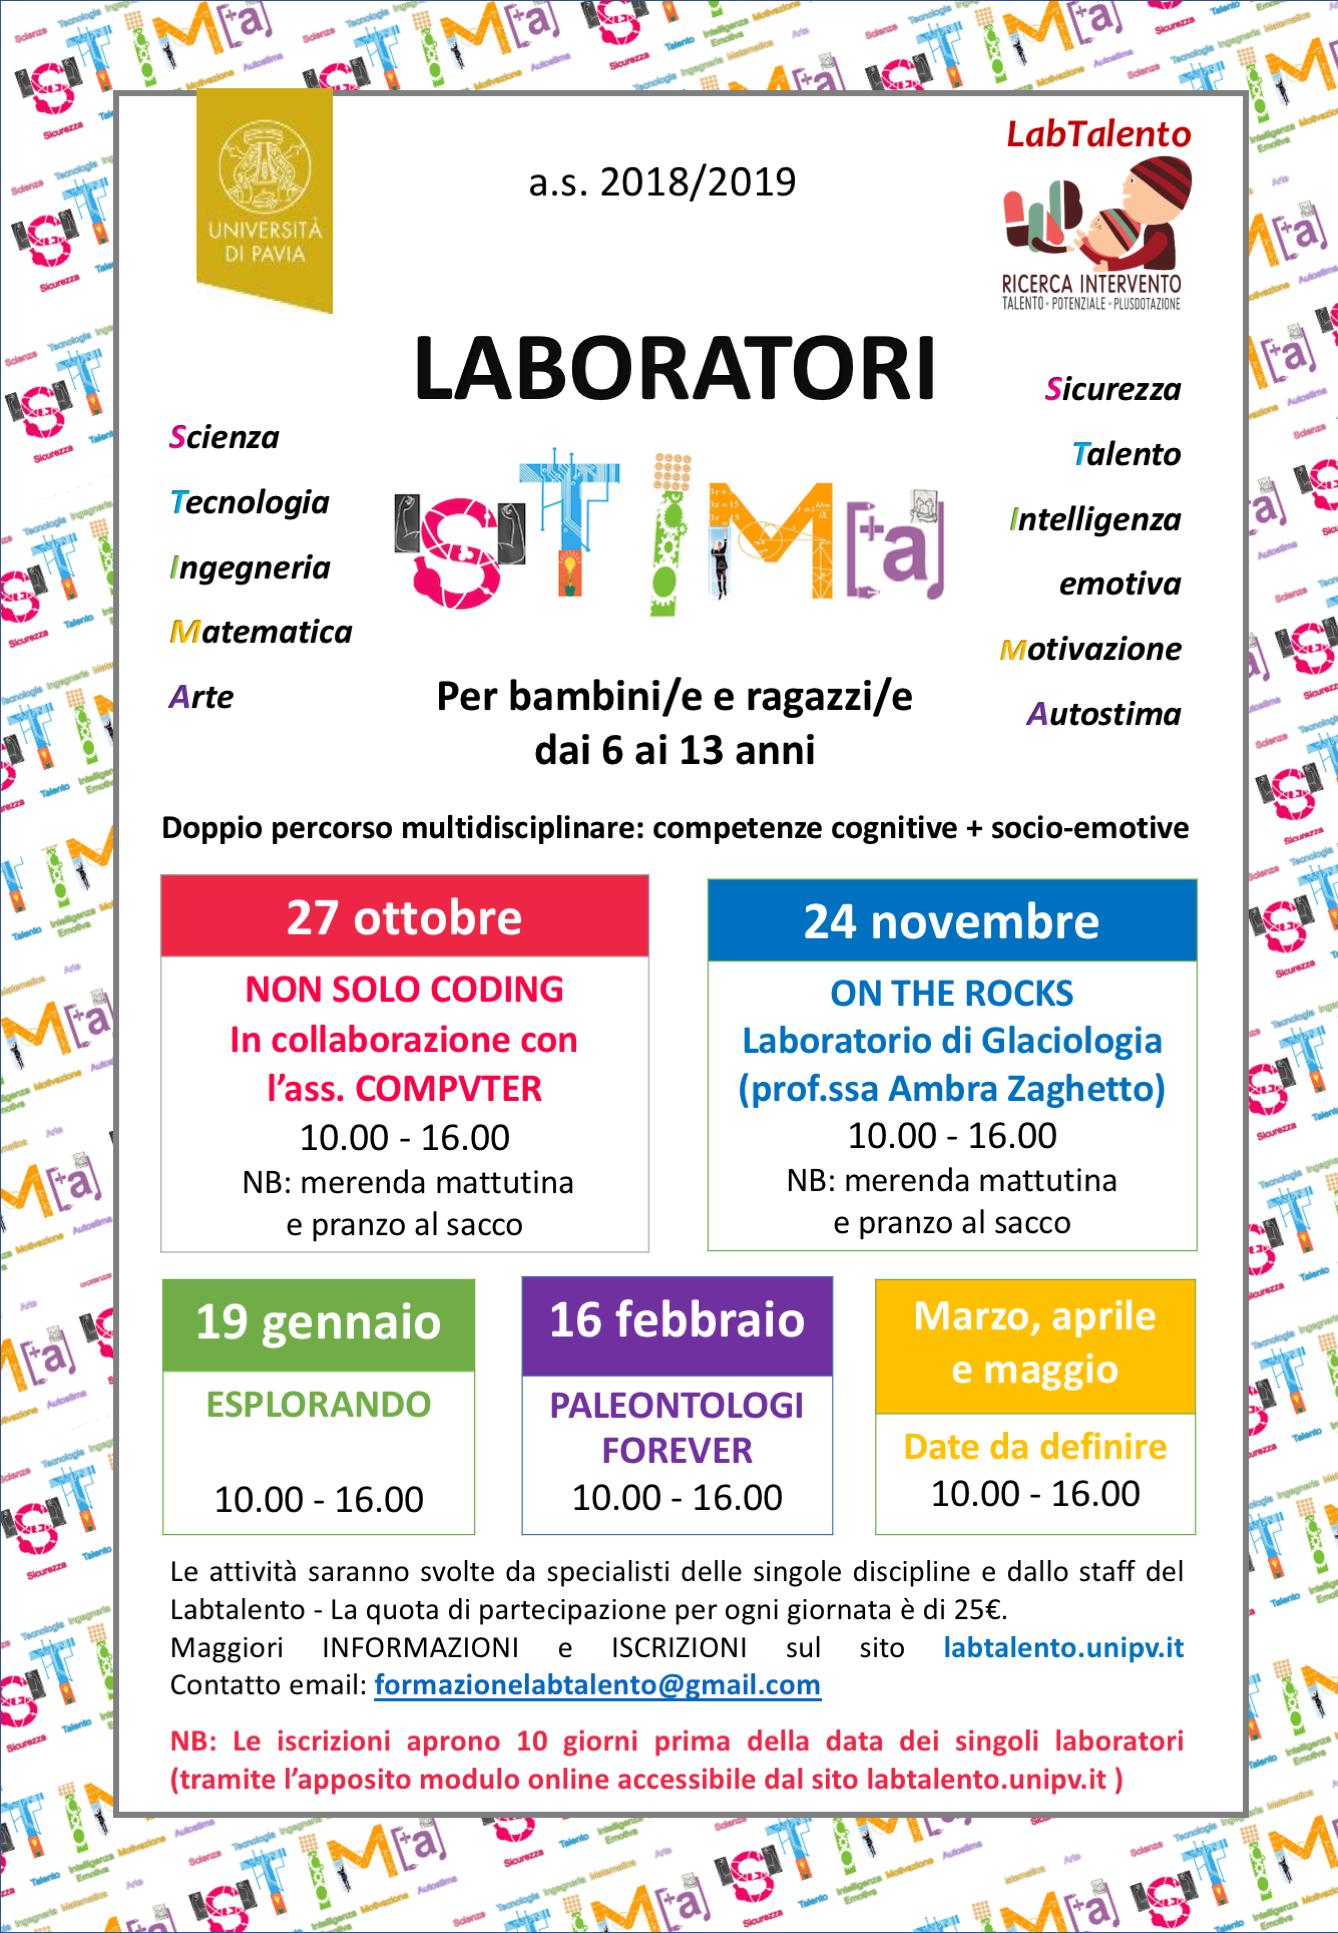 Locandina Laboratori STIMA as2018-2019